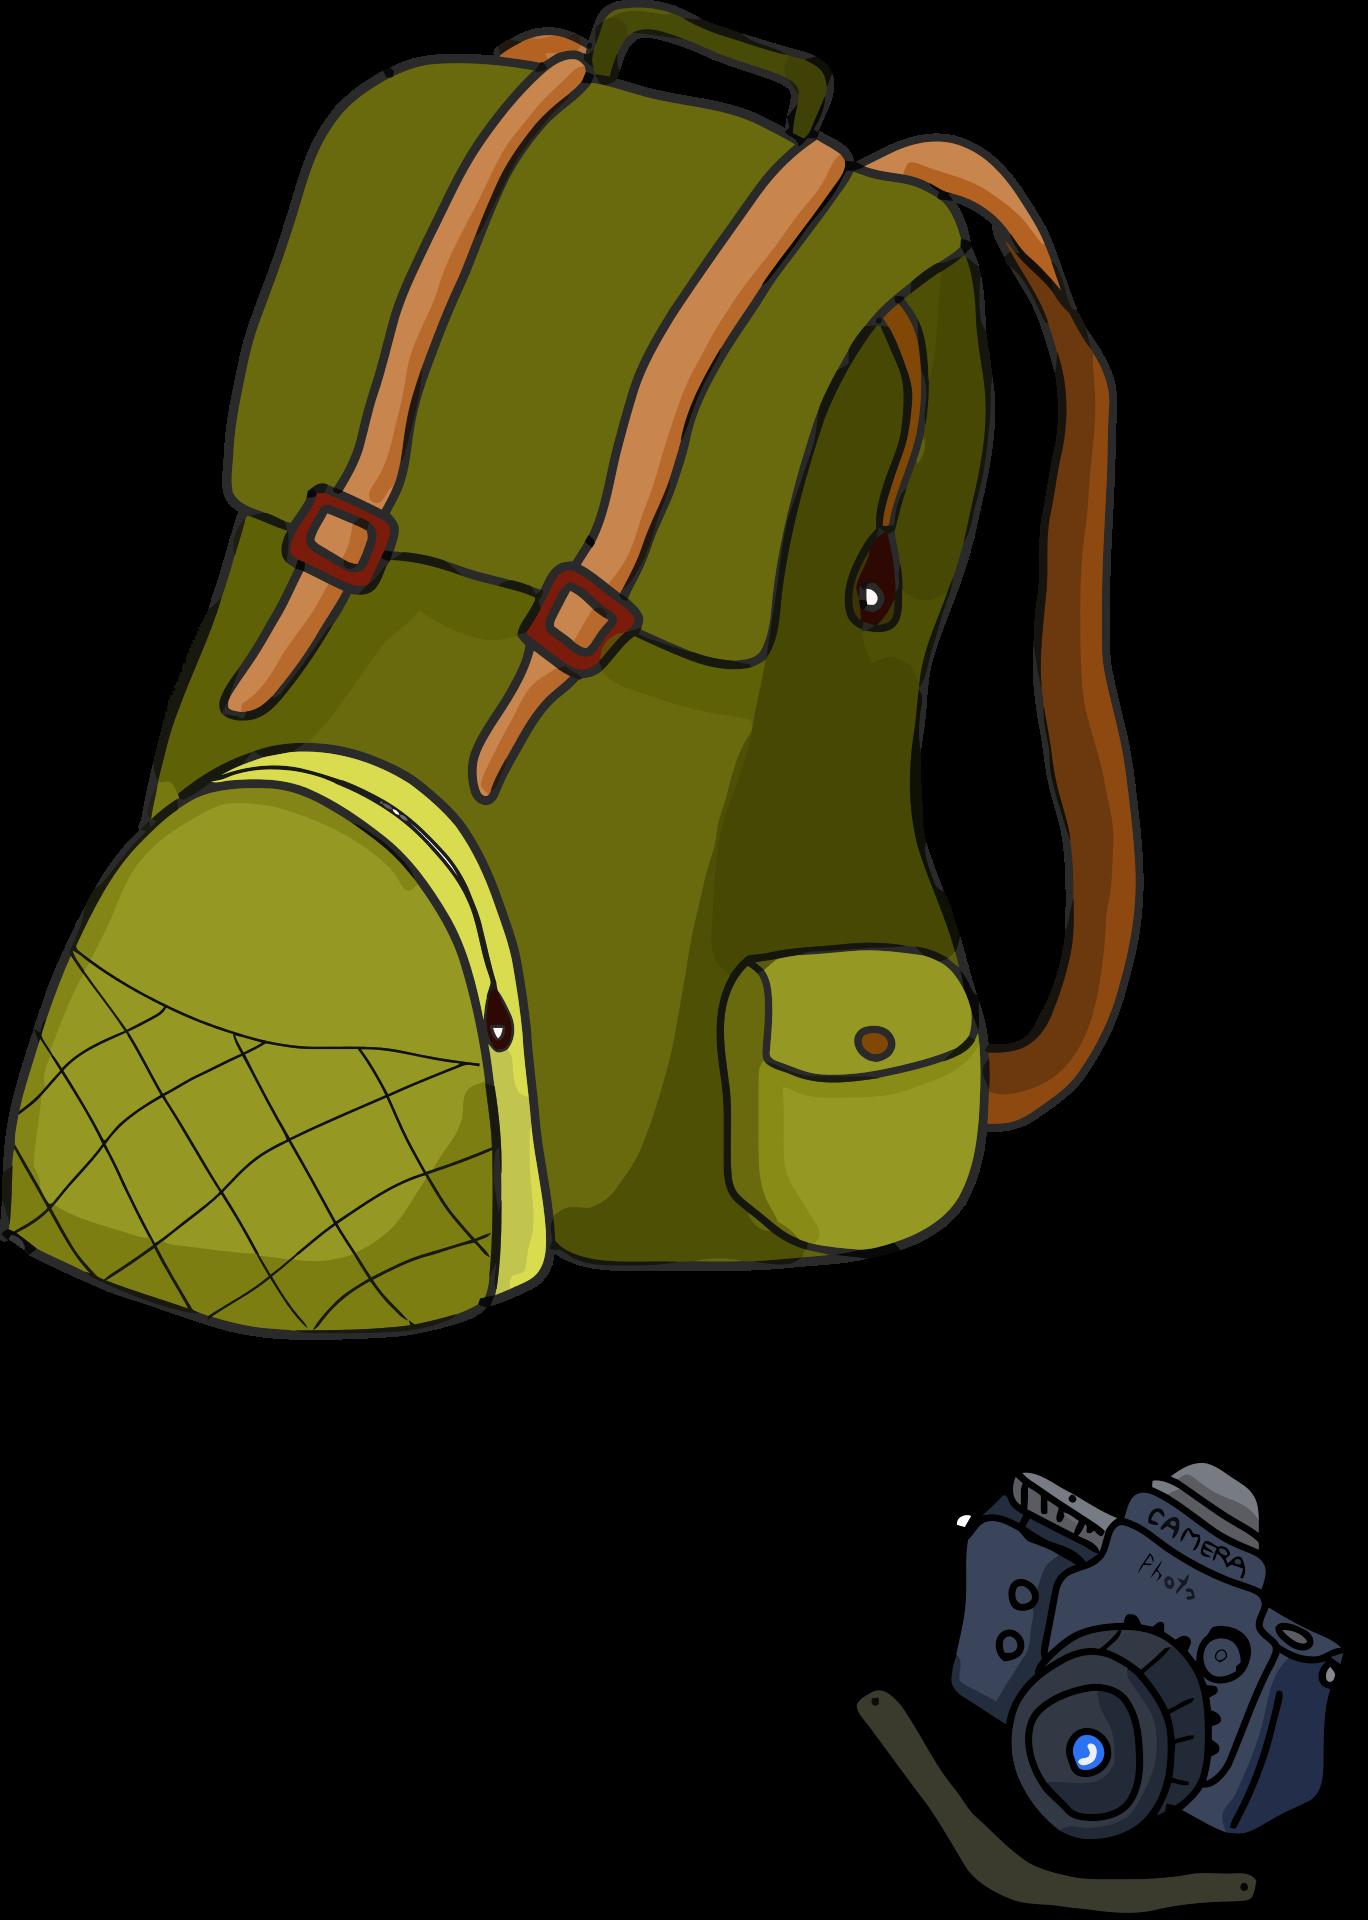 Backpacking hiking clip art. Hike clipart travel backpack